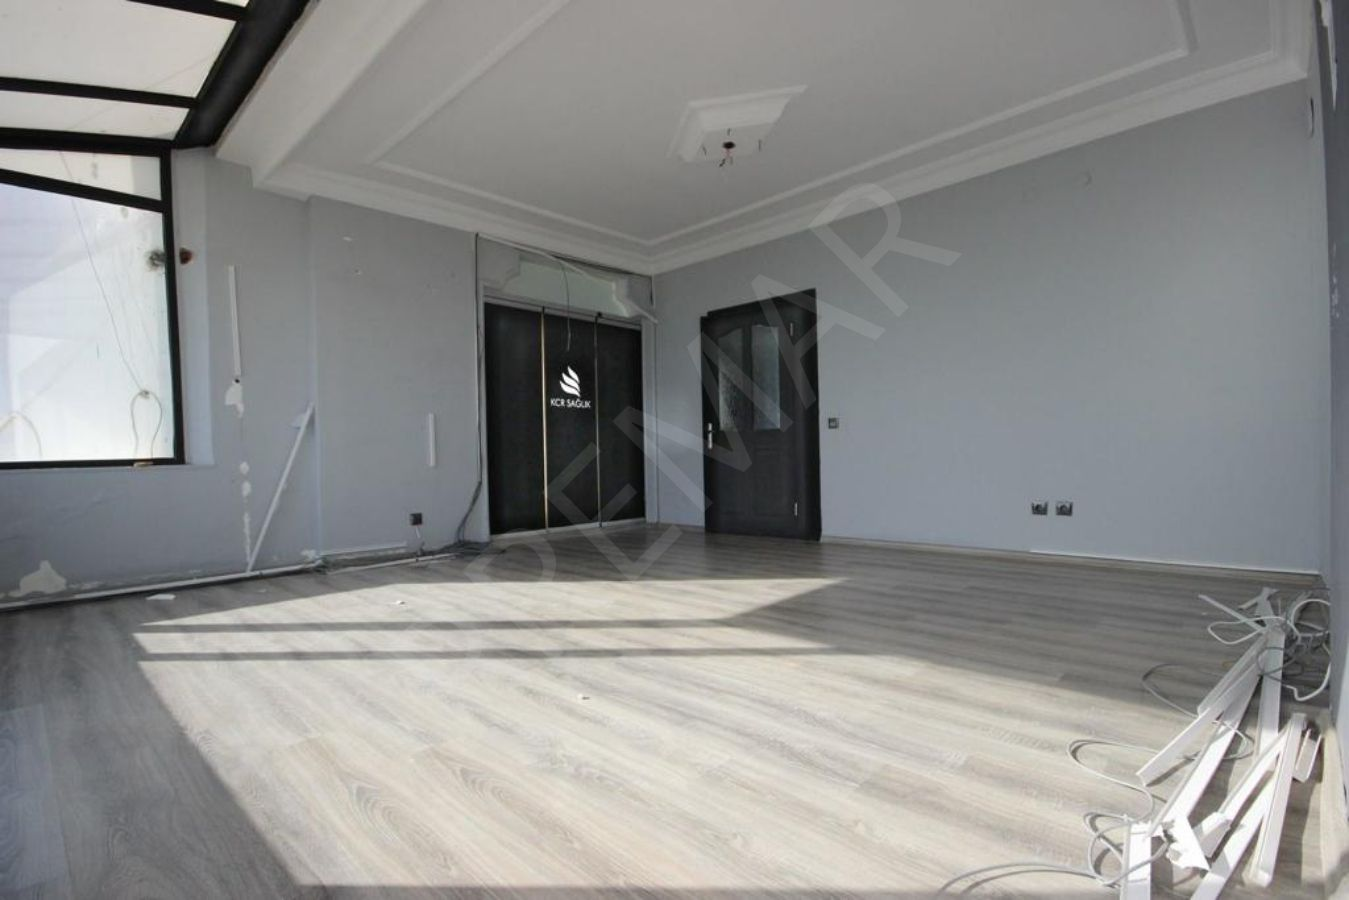 Premar Fa'dan Adnan Menderes'de Lebiderya Lüks Ofis